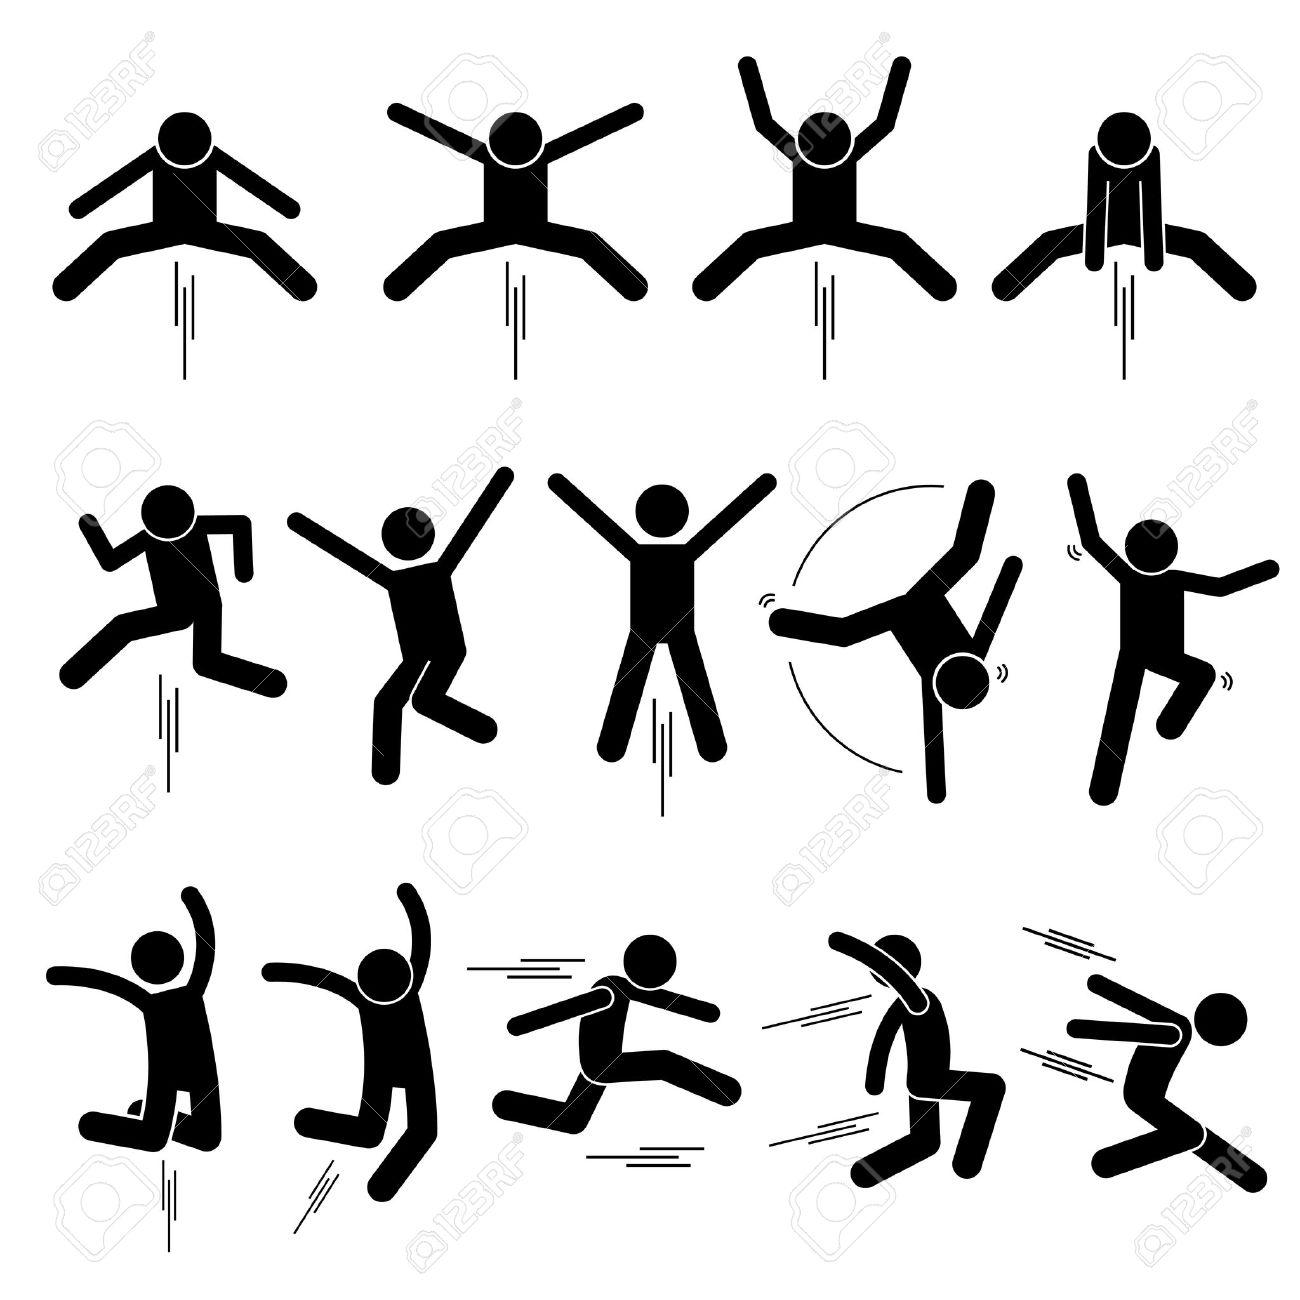 Various Jumper Human Man People Jumping Stick Figure Stickman Pictogram Icons - 65458059